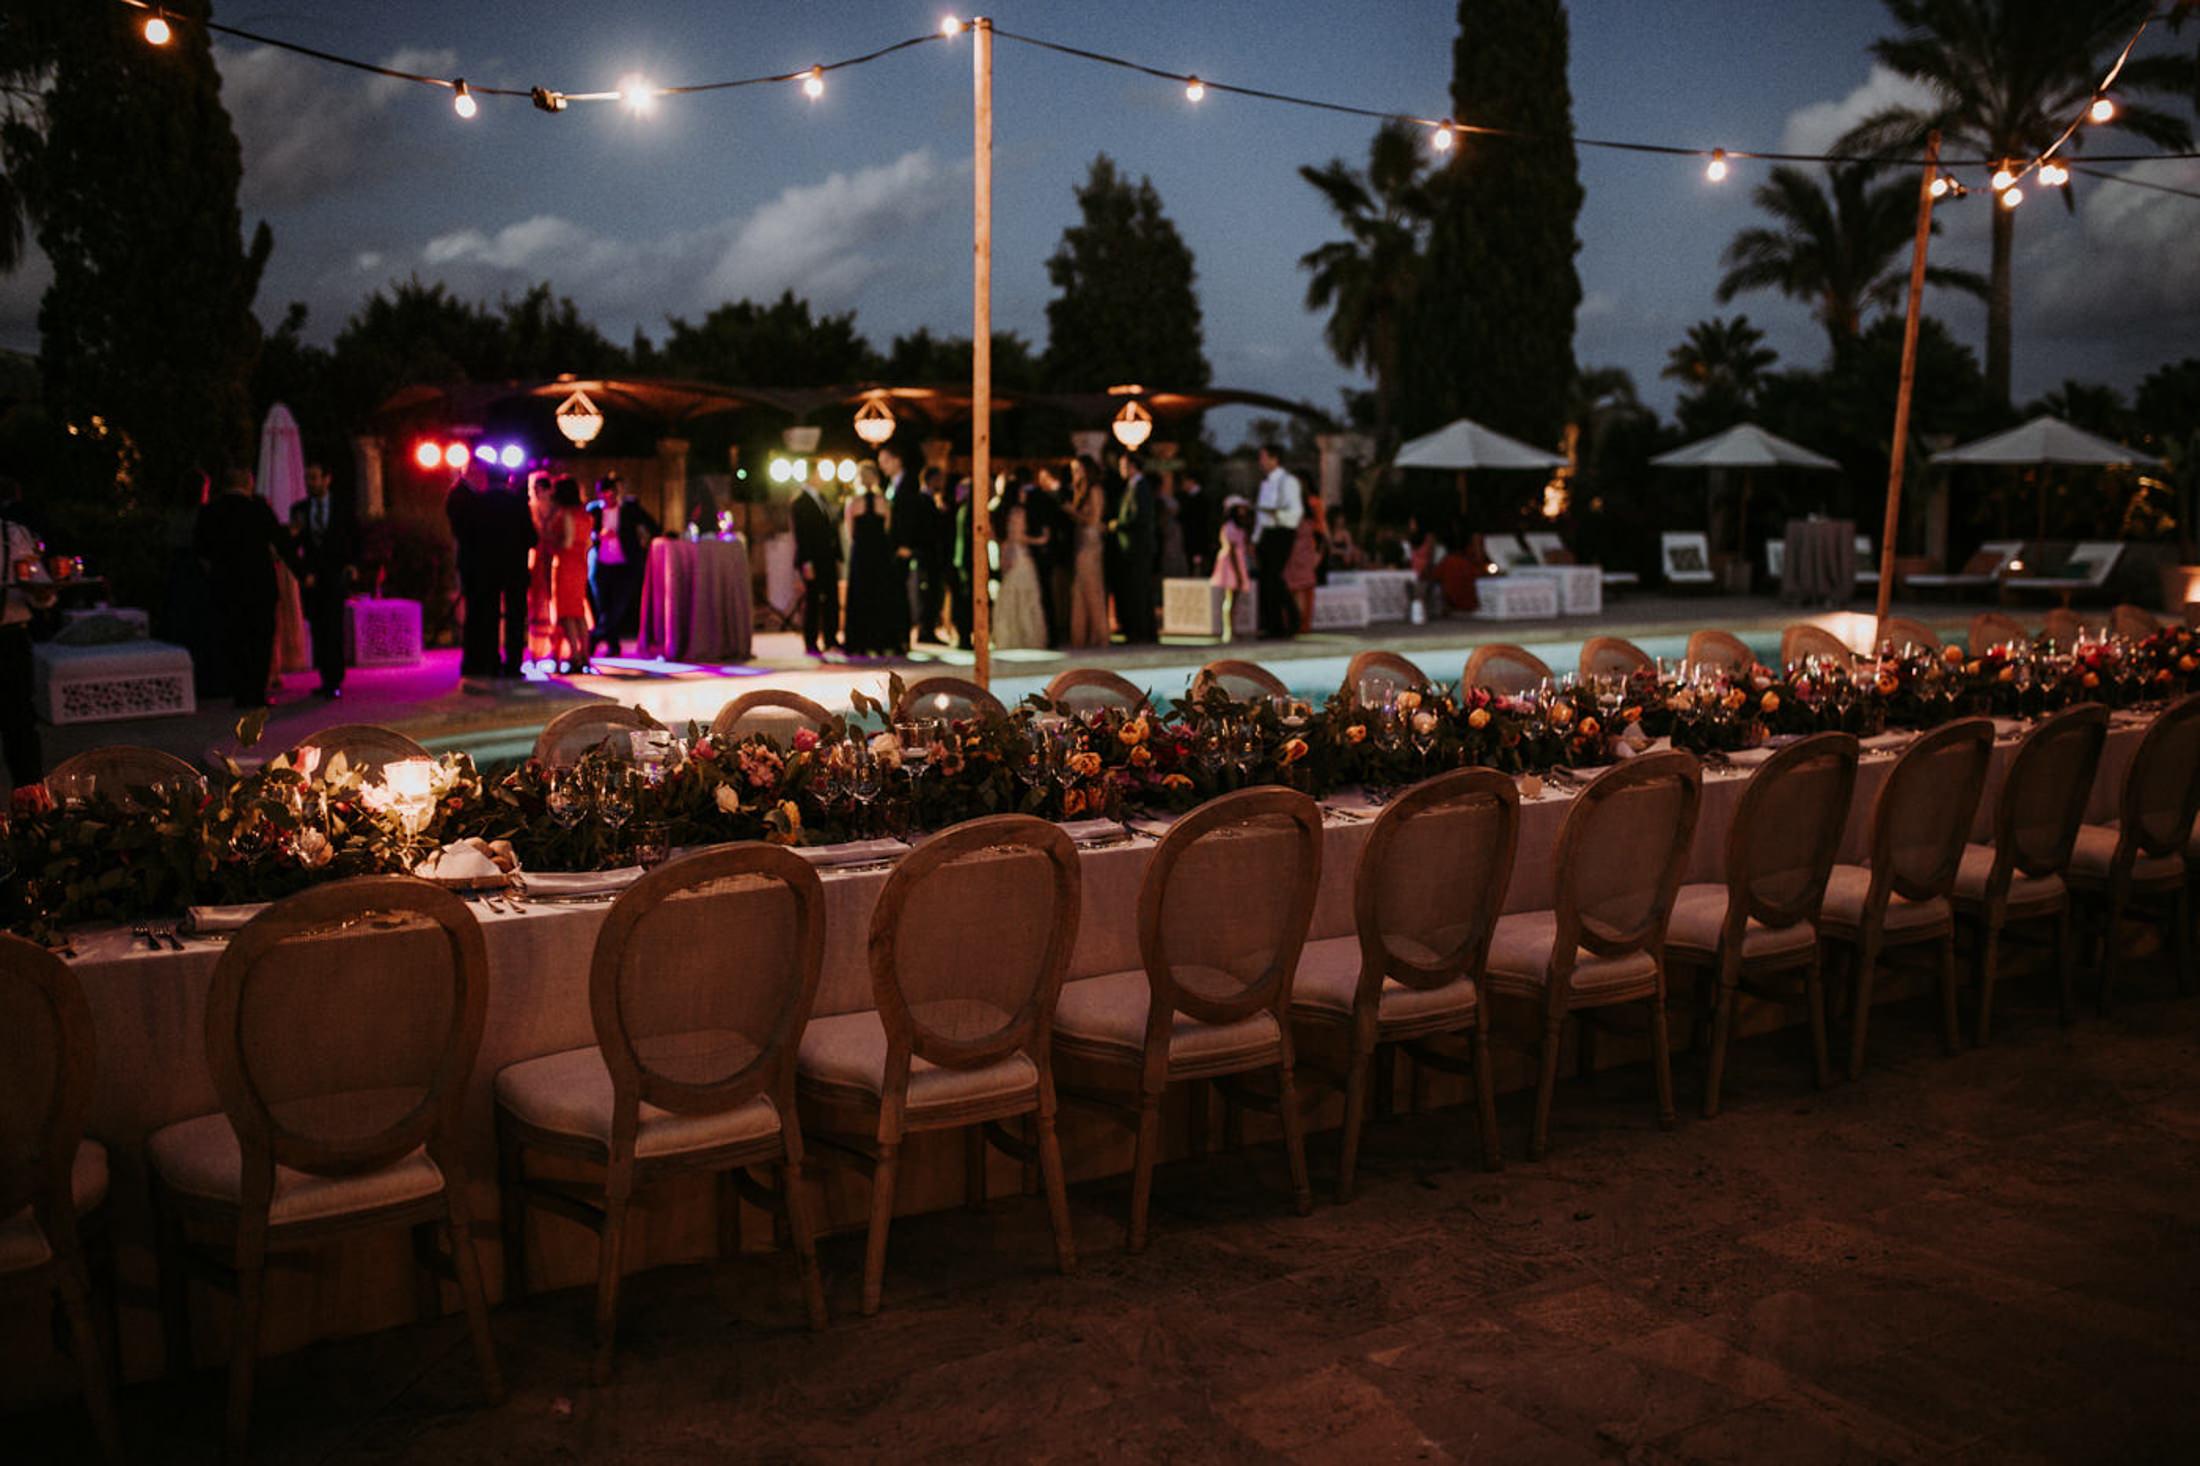 Wedding_Photographer_Mallorca_Daniela-Marquardt_Photography_New_York_Iceland_Tuscany_Santorini_Portugal_Austria_Bavaria_Elopement_Hochzeitsfotograf_AntjeRajat2_111